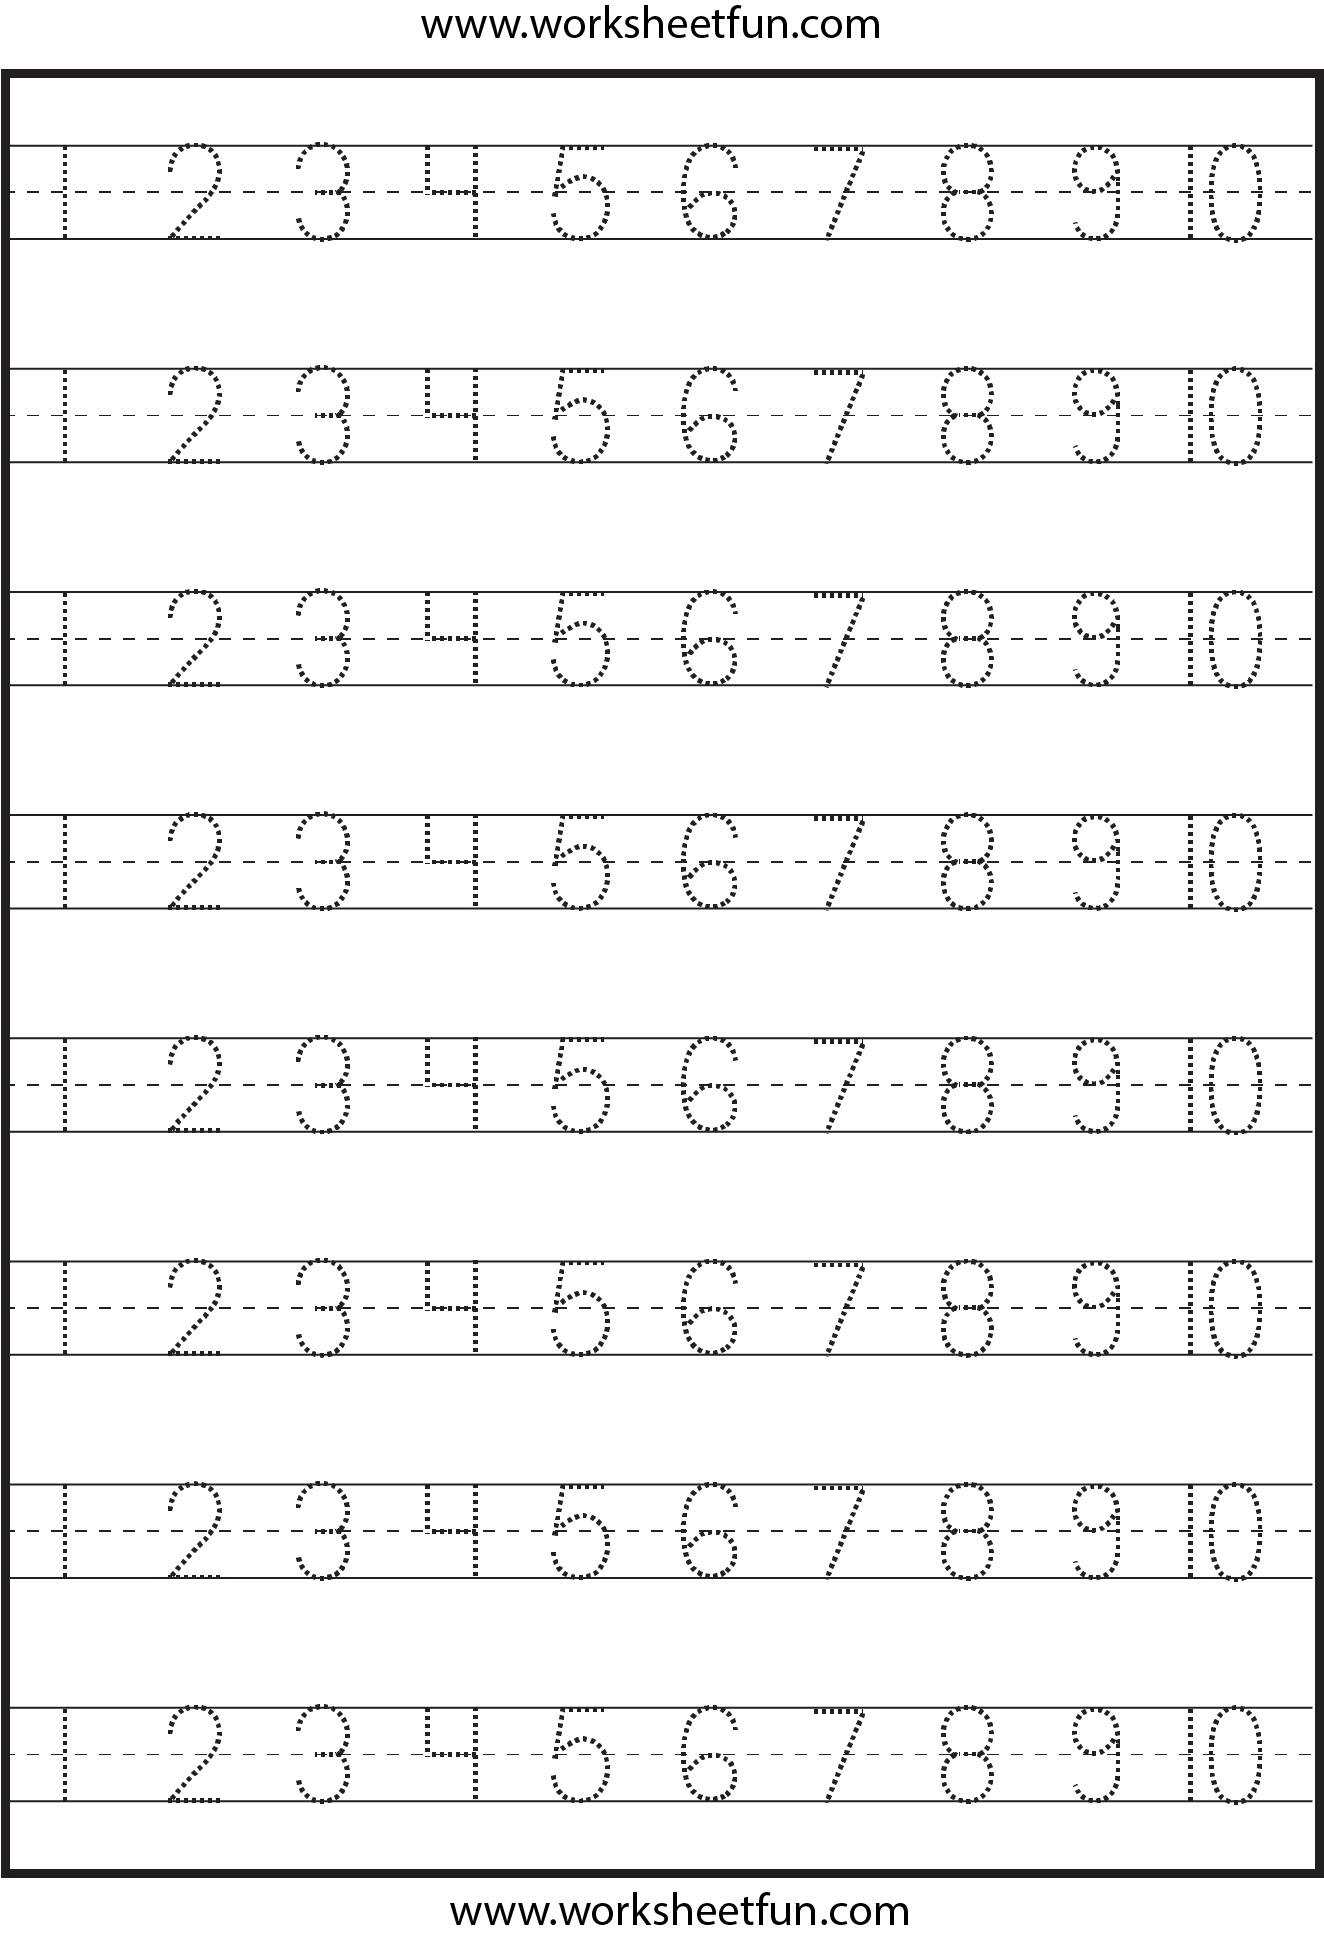 Number Tracing 1-10 - Worksheet | Free Preschool Worksheets with Letter 10 Worksheets